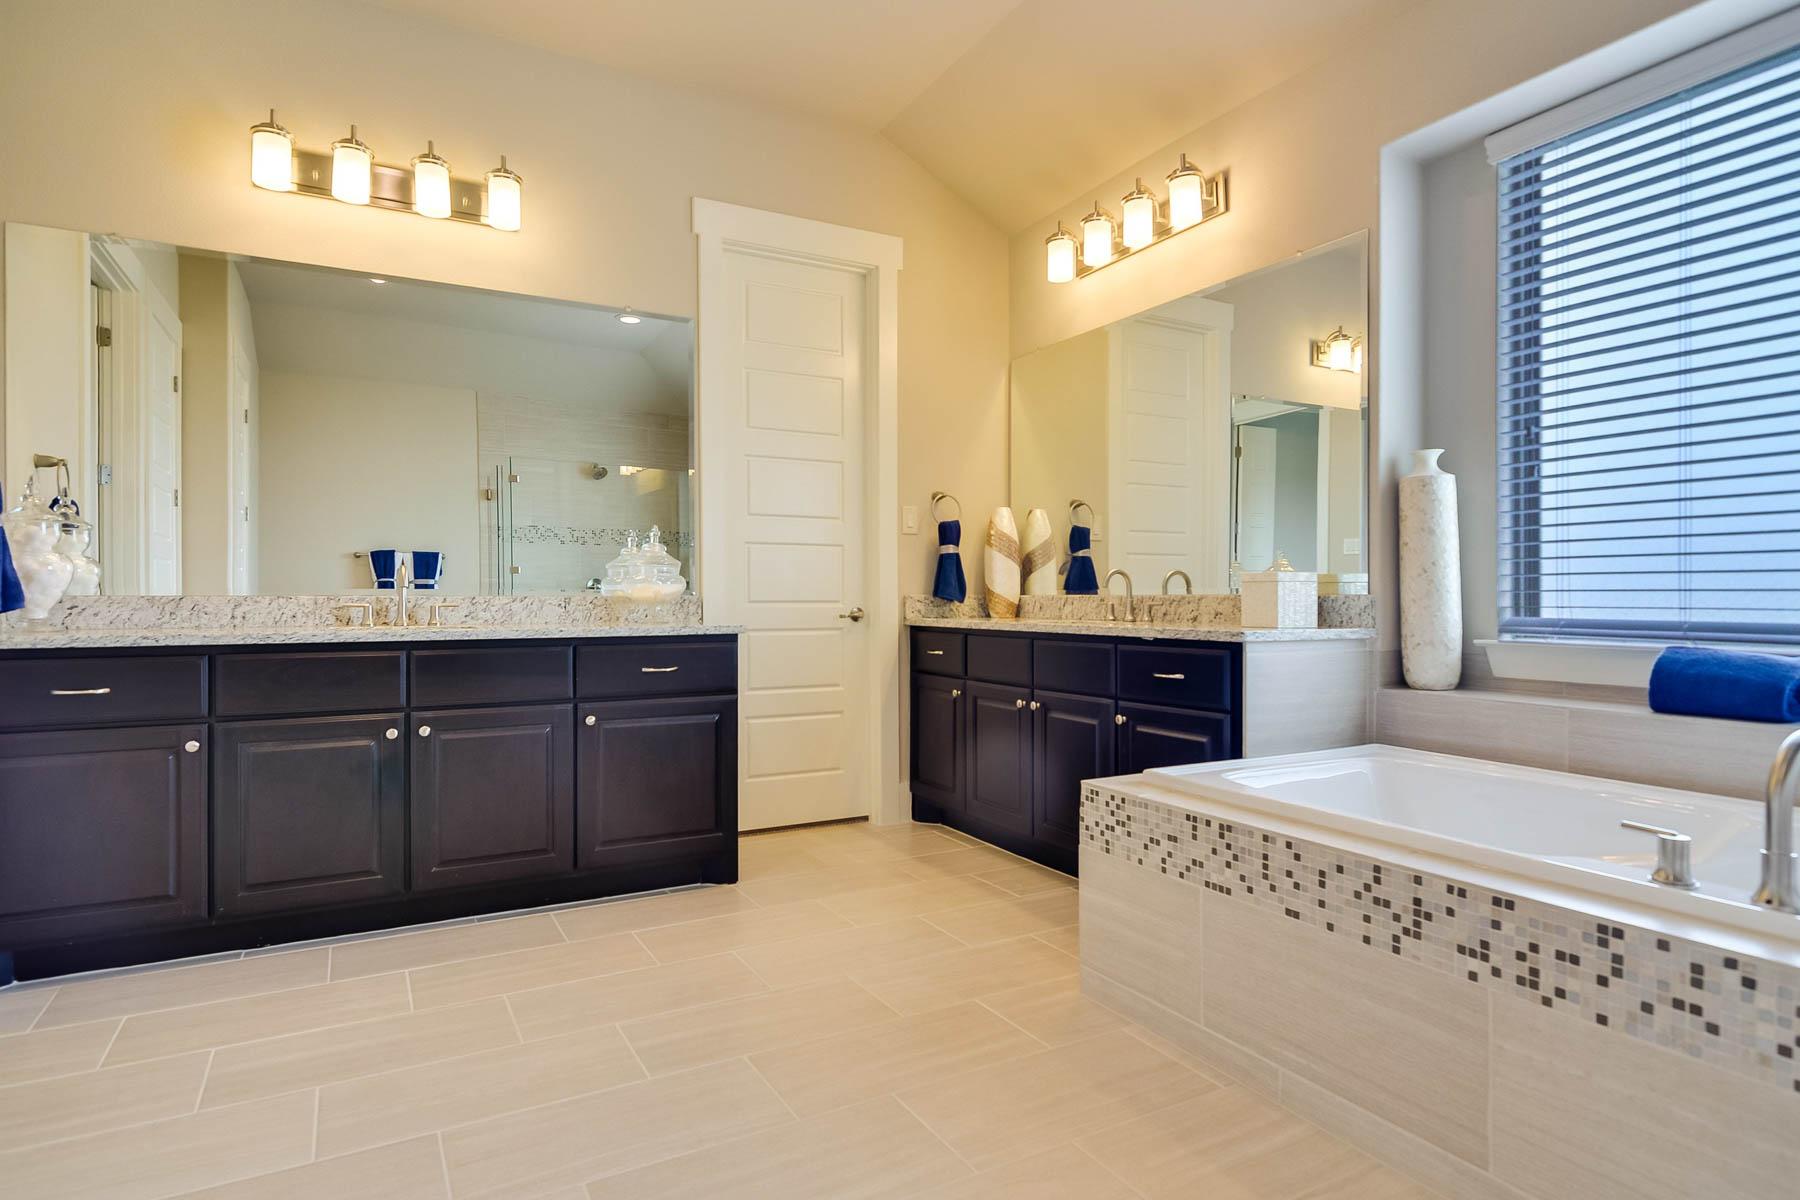 Additional photo for property listing at Stunning Brohn Home on a Corner Lot 8218 Garden Arbor San Antonio, Texas 78266 Estados Unidos